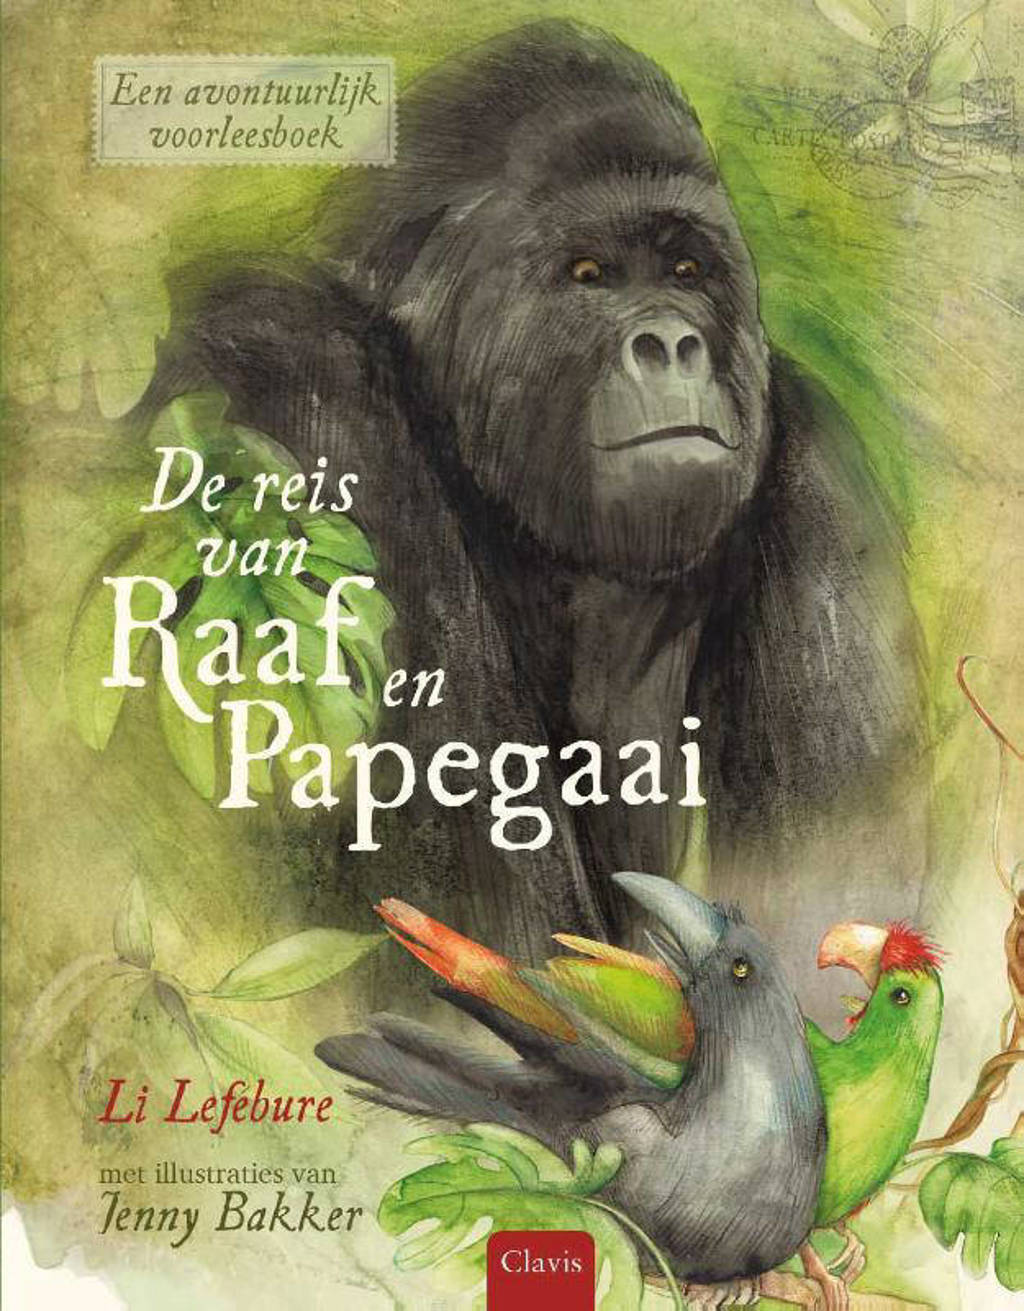 De reis van Raaf en Papegaai - Li Lefébure